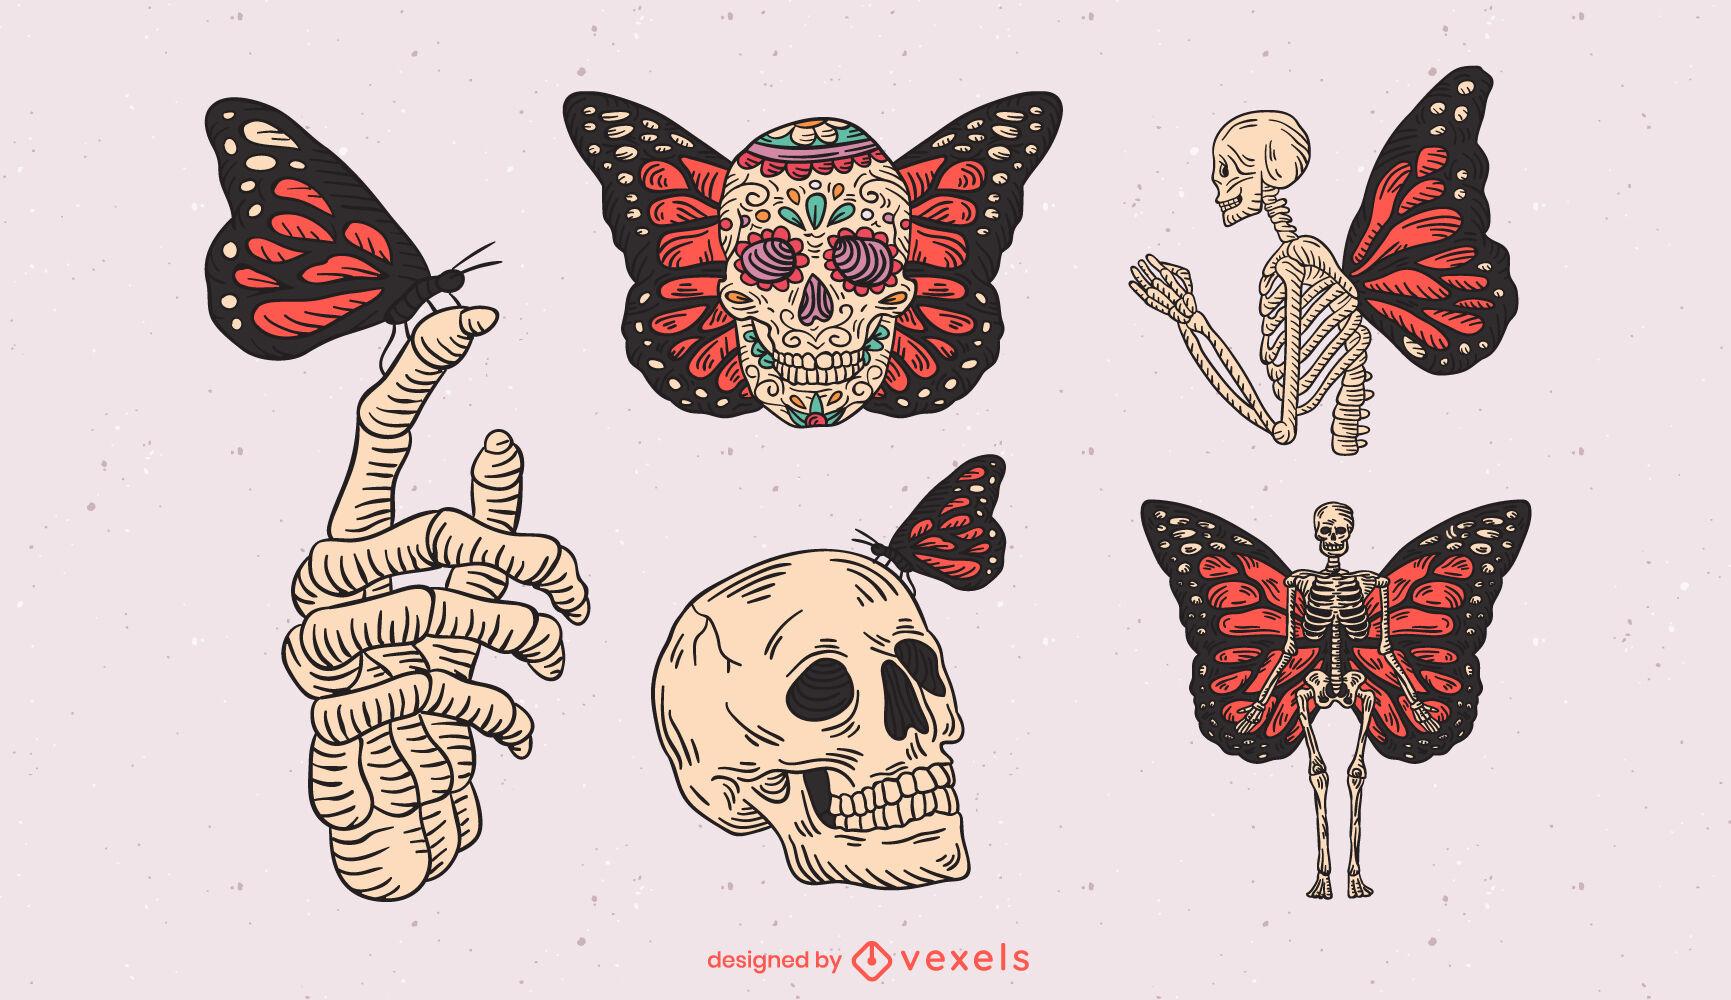 Conjunto de traços coloridos de esqueletos e borboletas